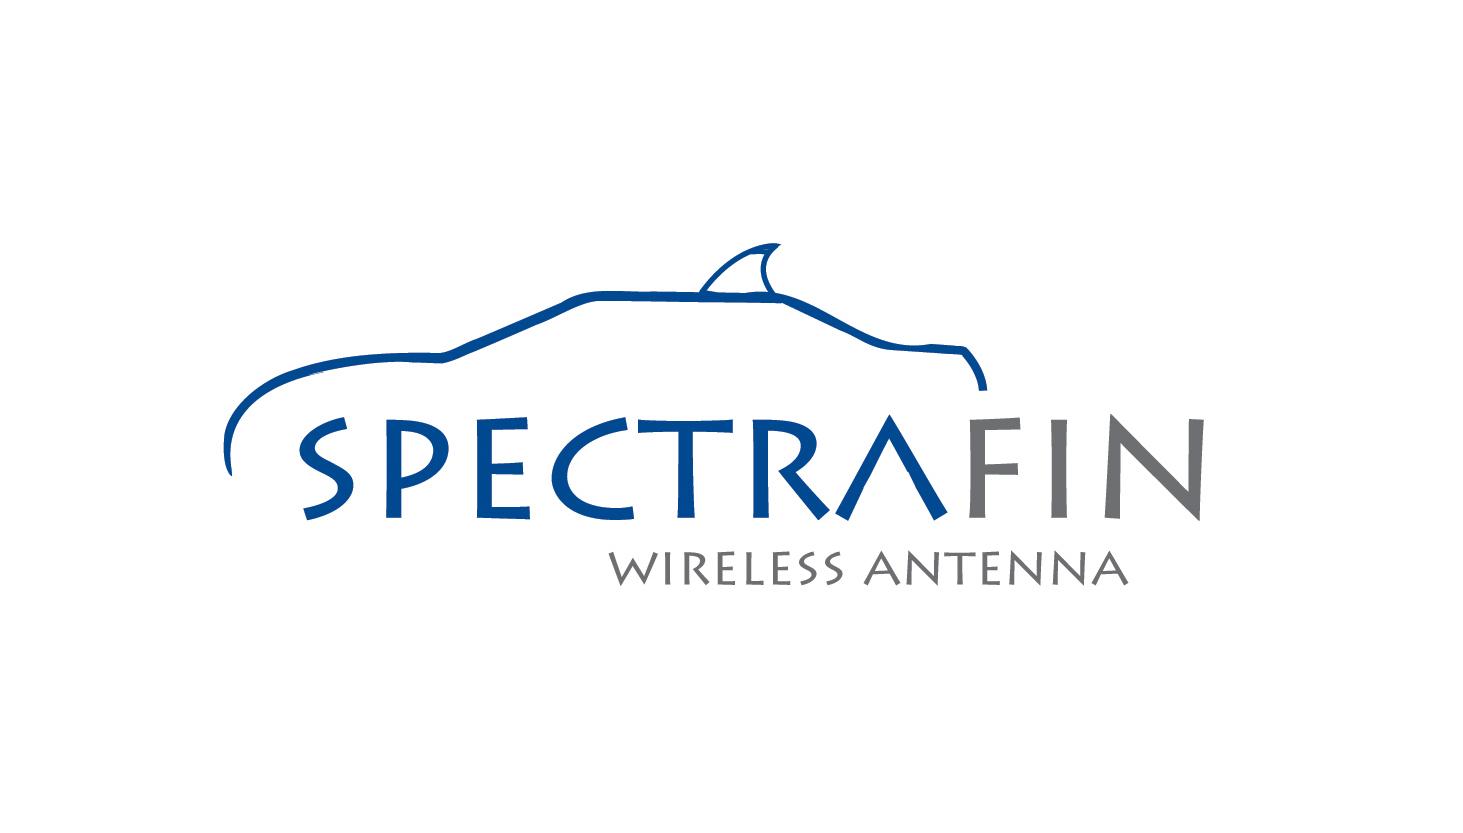 logo-design-brand-antenna.jpg